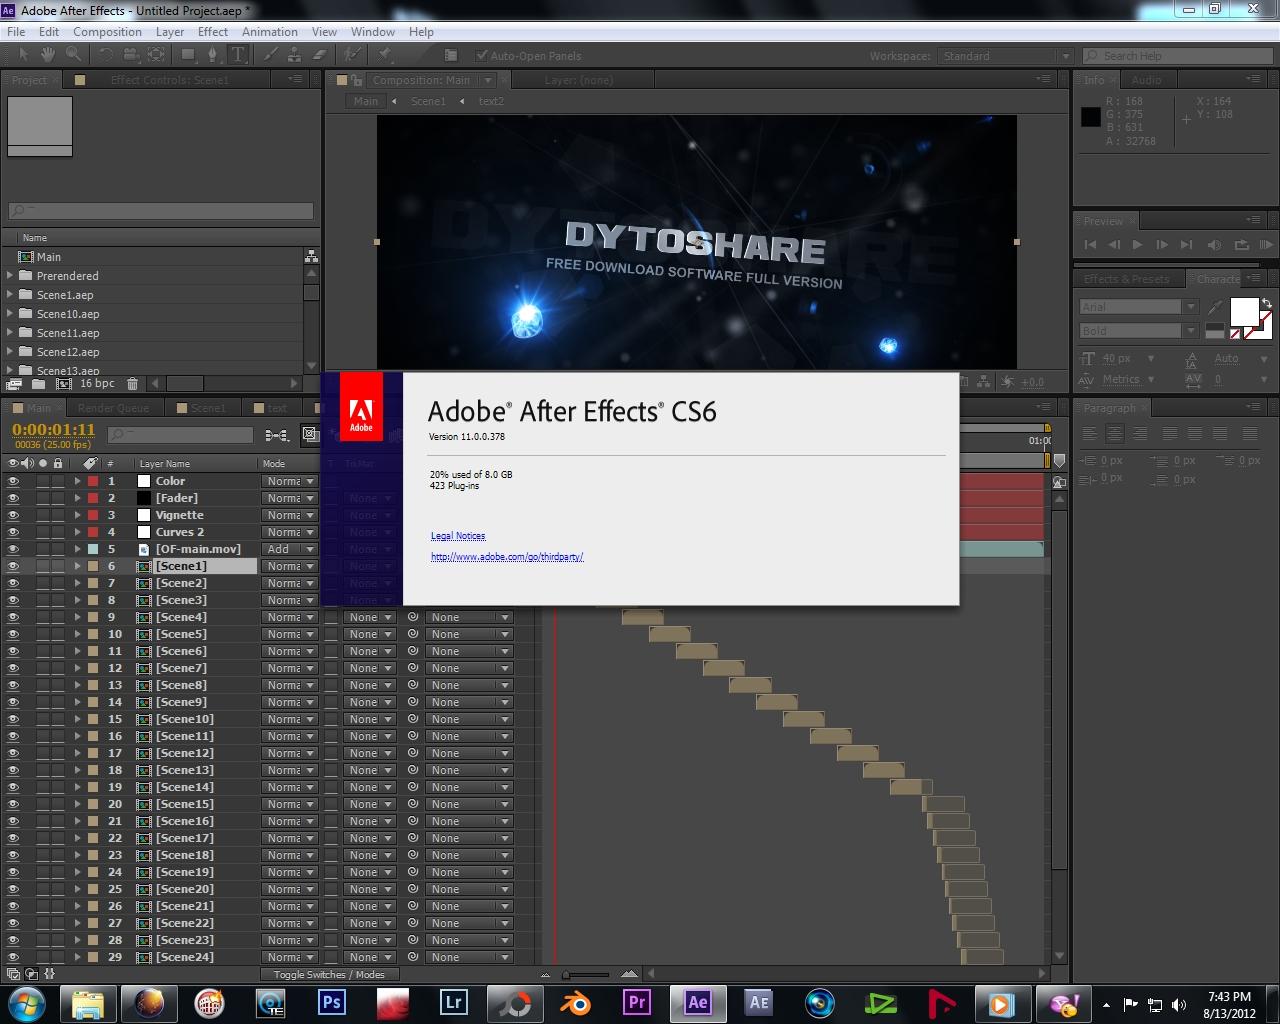 Adobe After Effect CS6 Full Version » Download Software Gratis